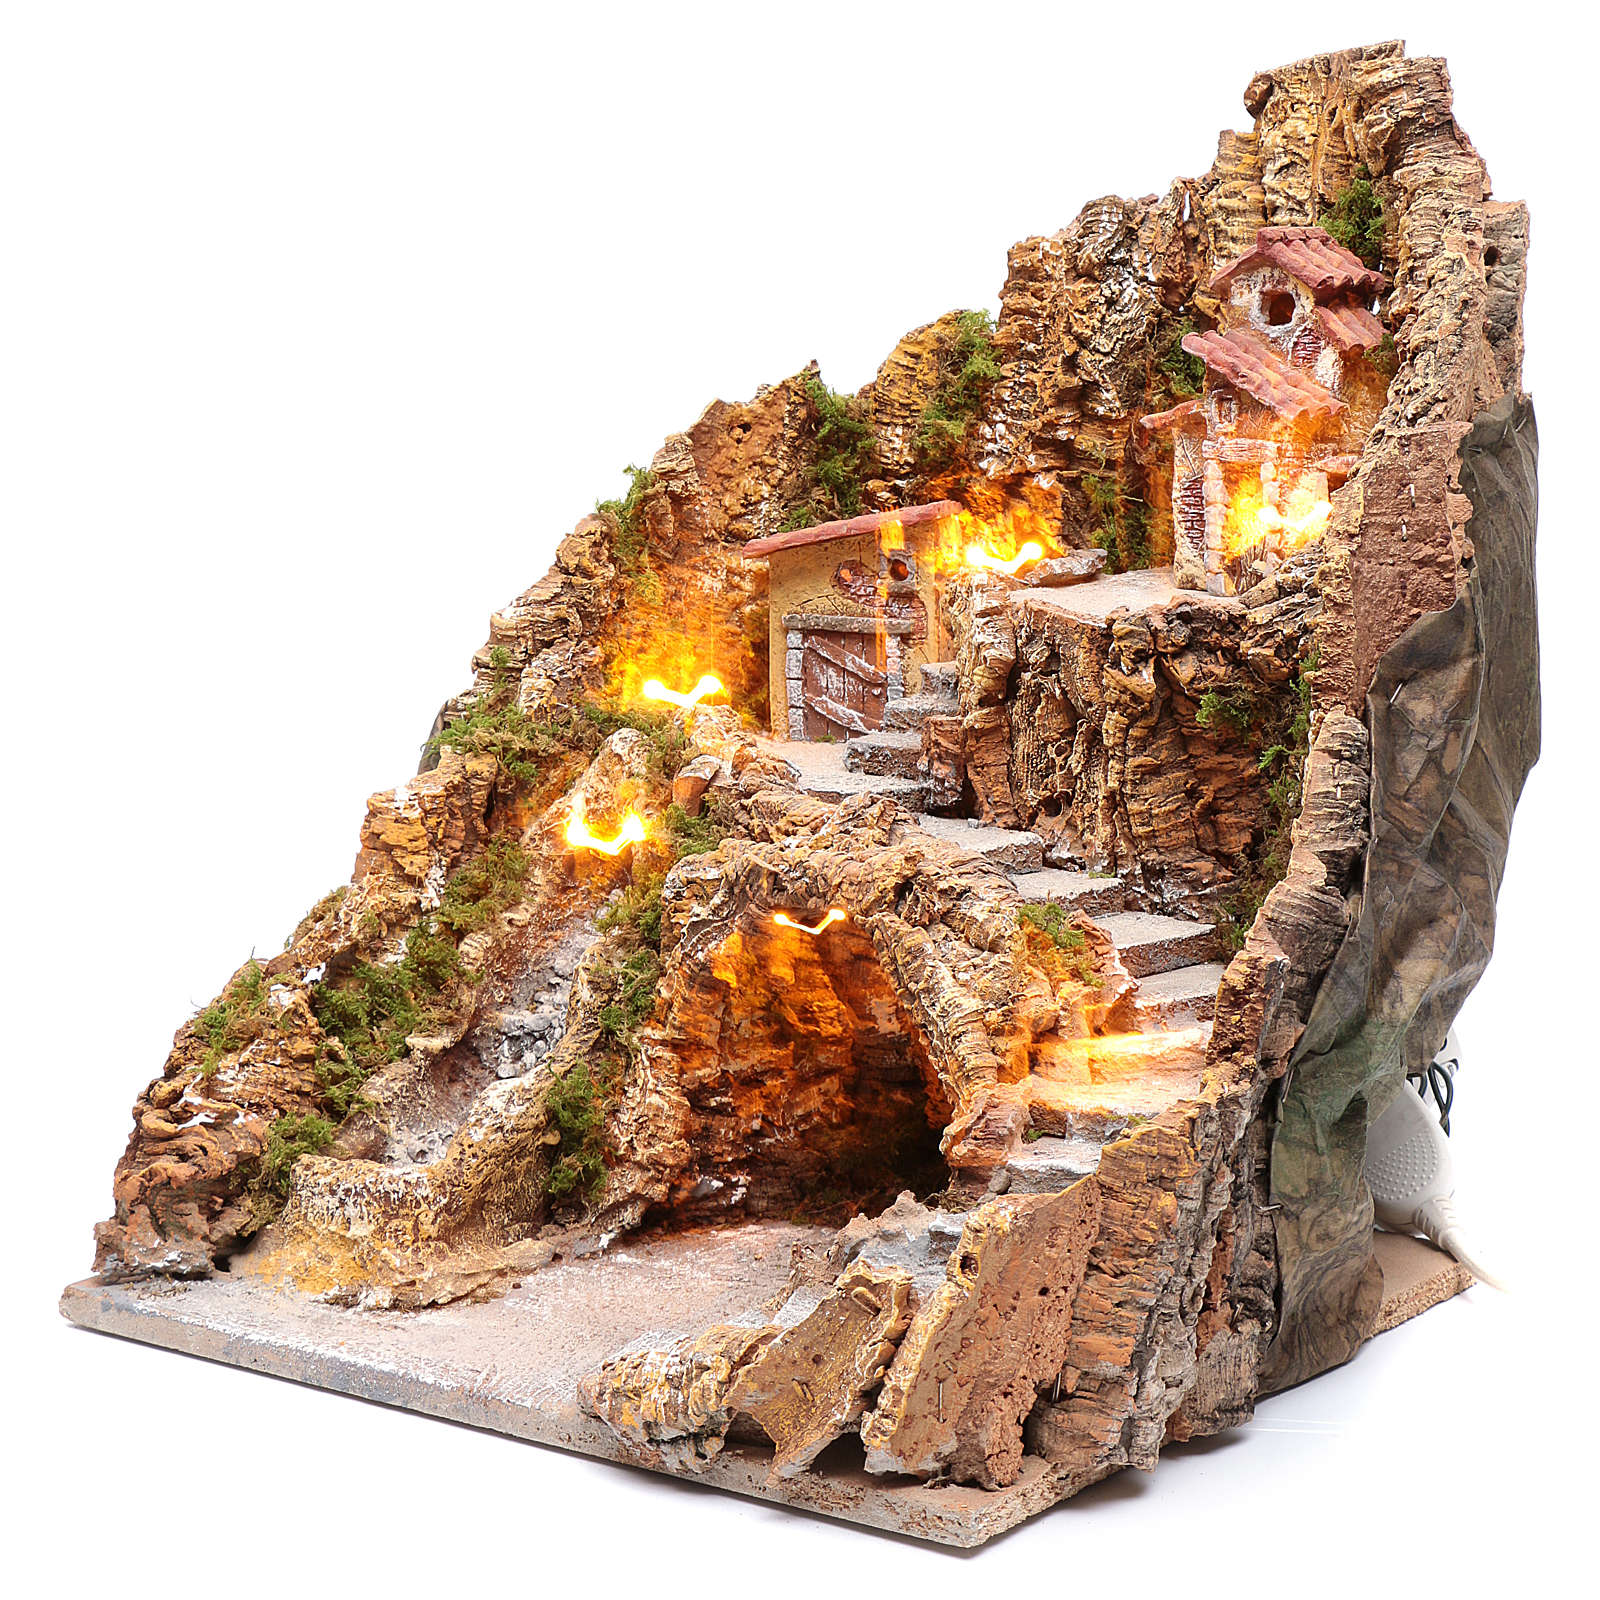 Presepe napoletano illuminato cascata e capanna 40X35X30 4